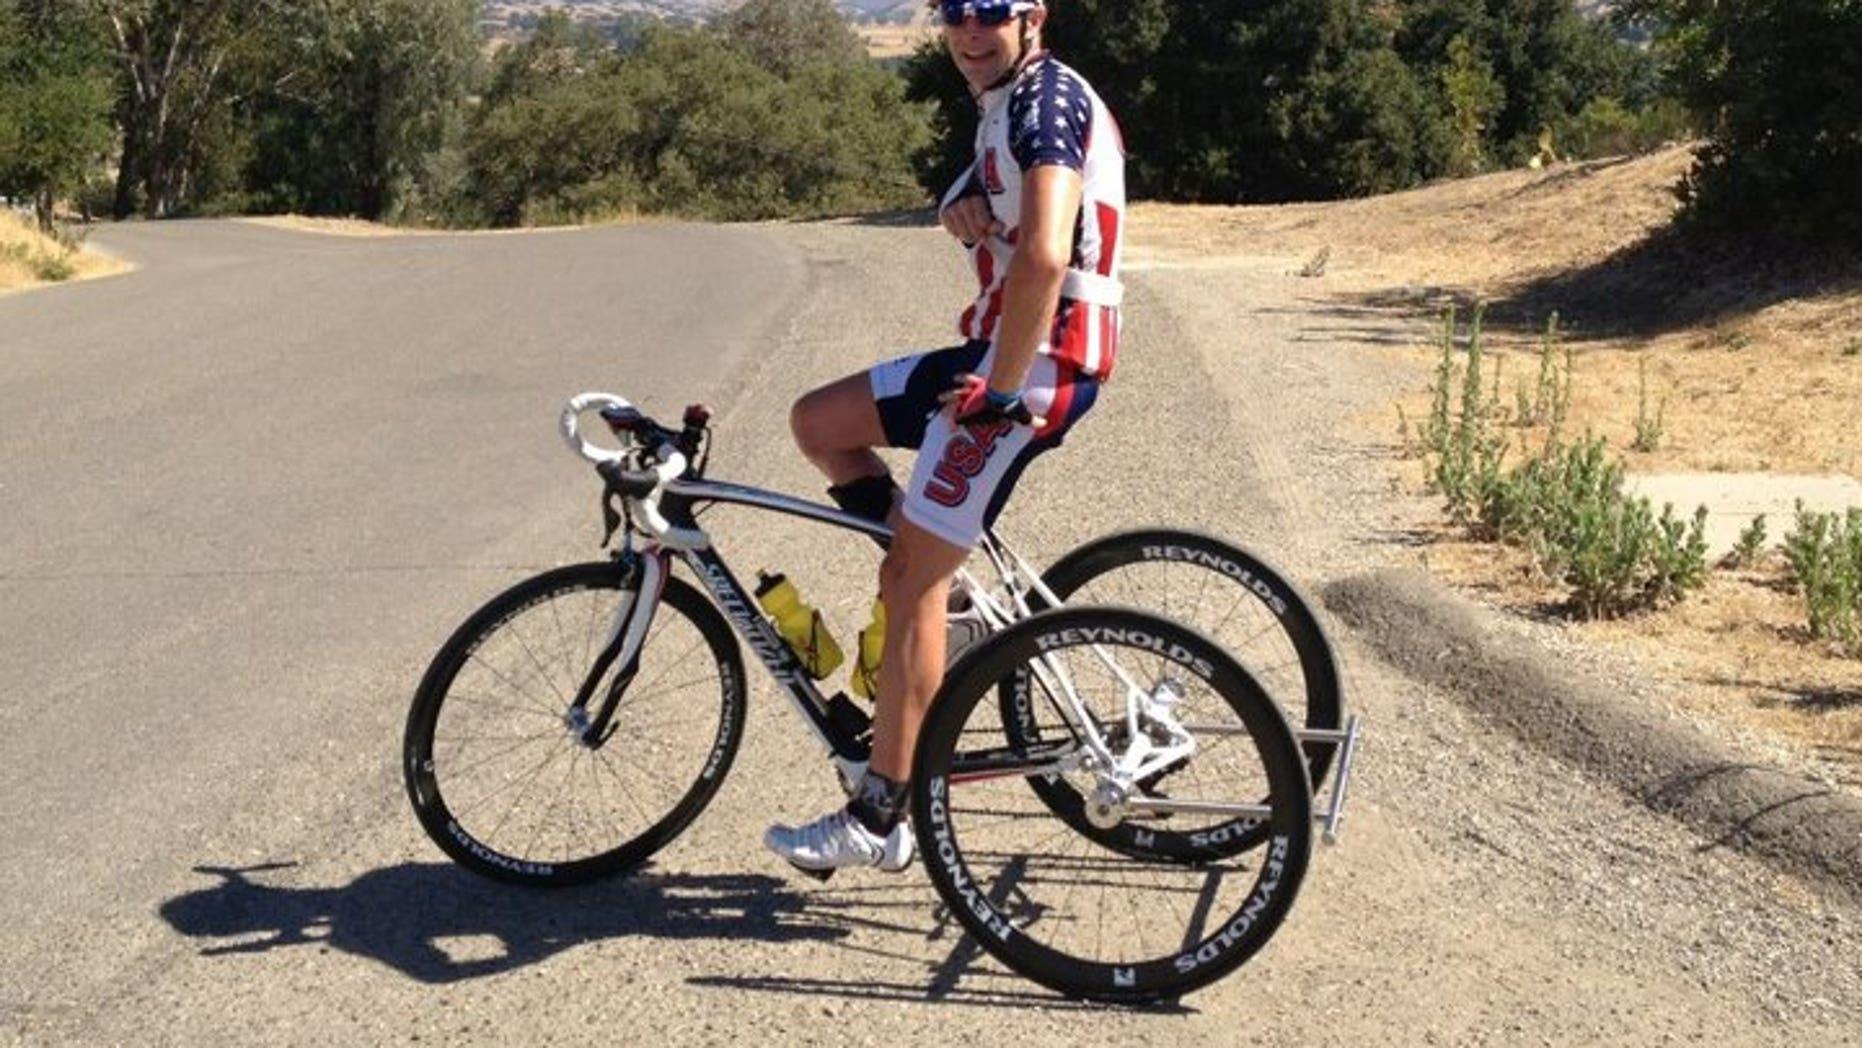 Steven Peace on his bike.